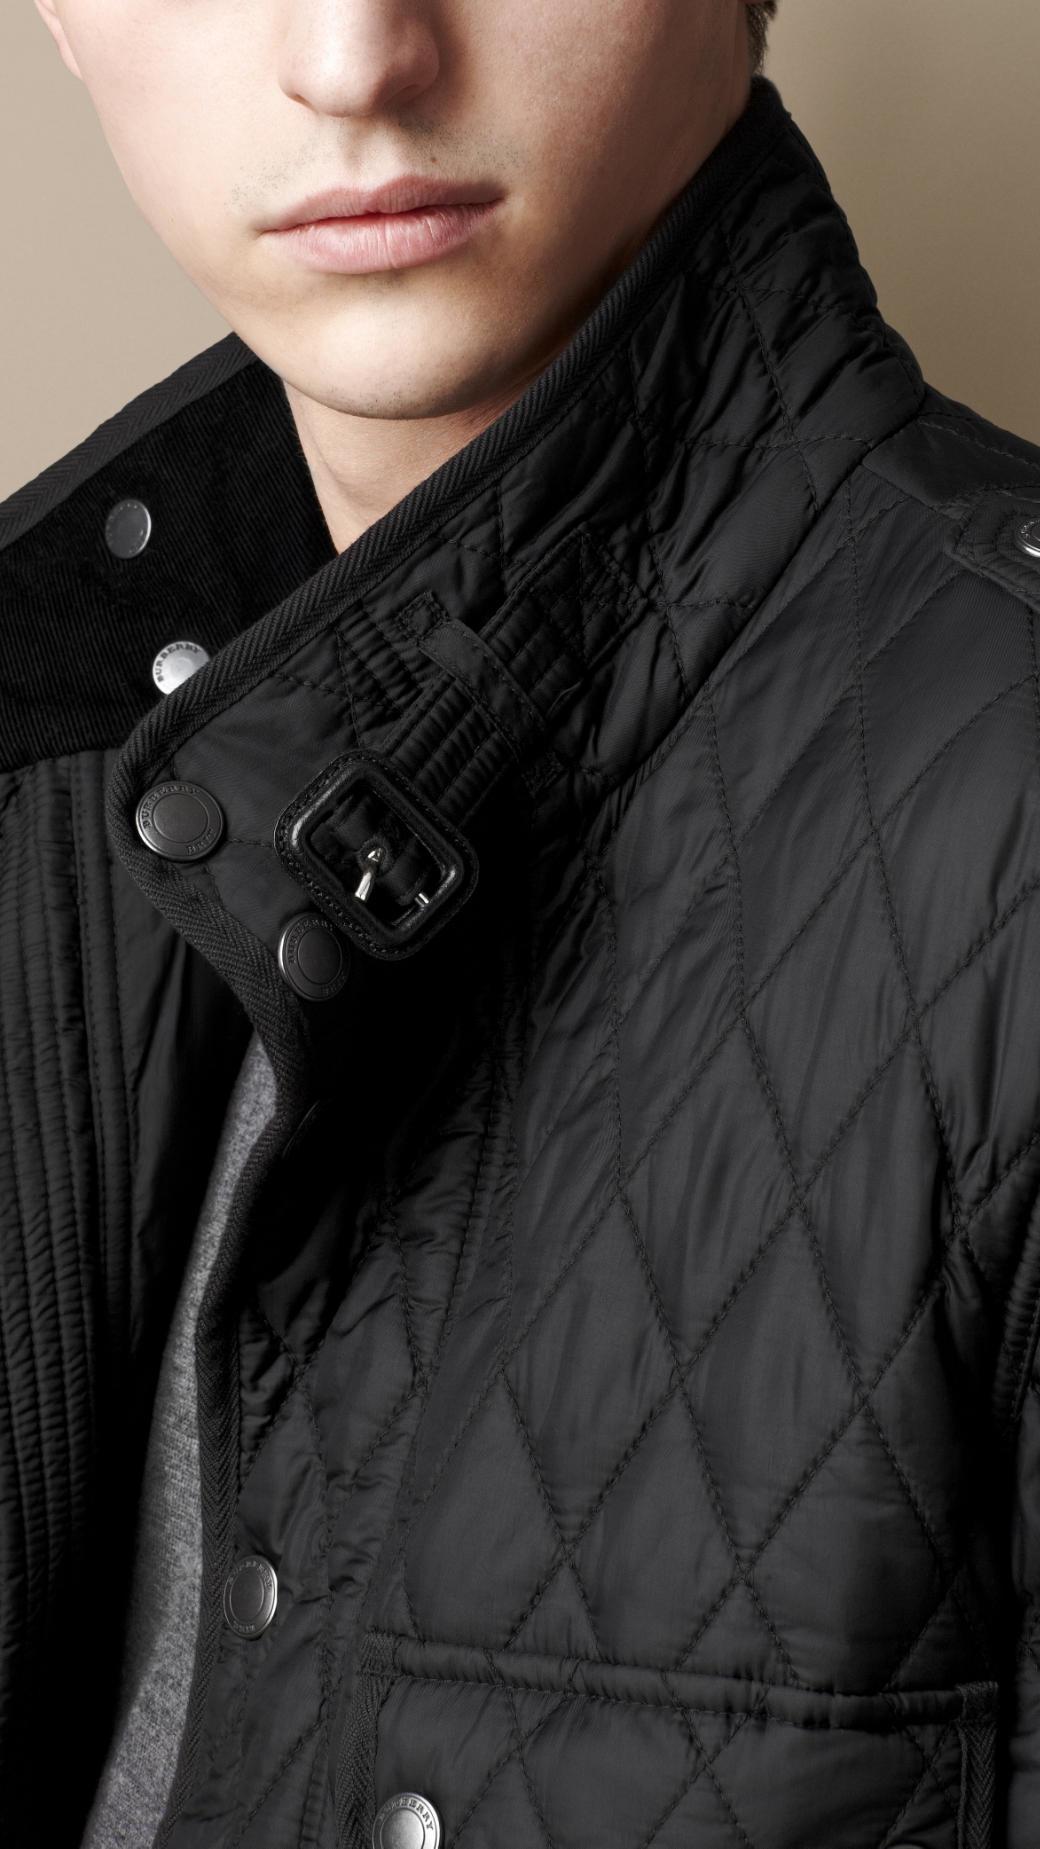 Burberry Diamond Quilted Field Jacket in Black for Men | Lyst : burberry diamond quilted jacket sale - Adamdwight.com